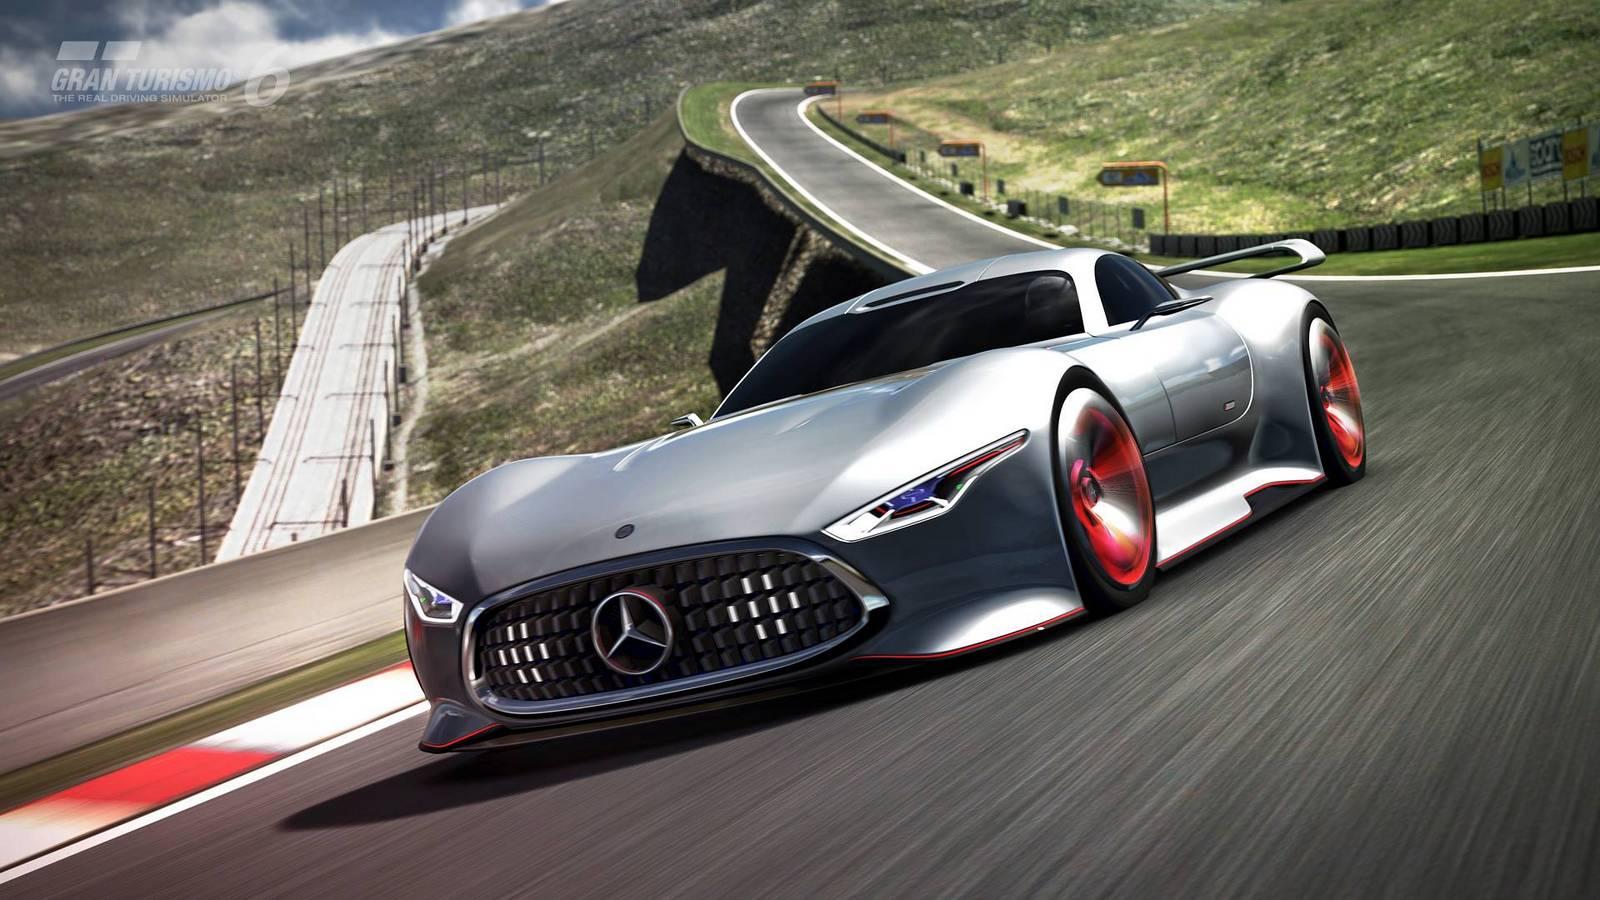 Gran Turismo 6: Mercedes AMG VGT Racing Series